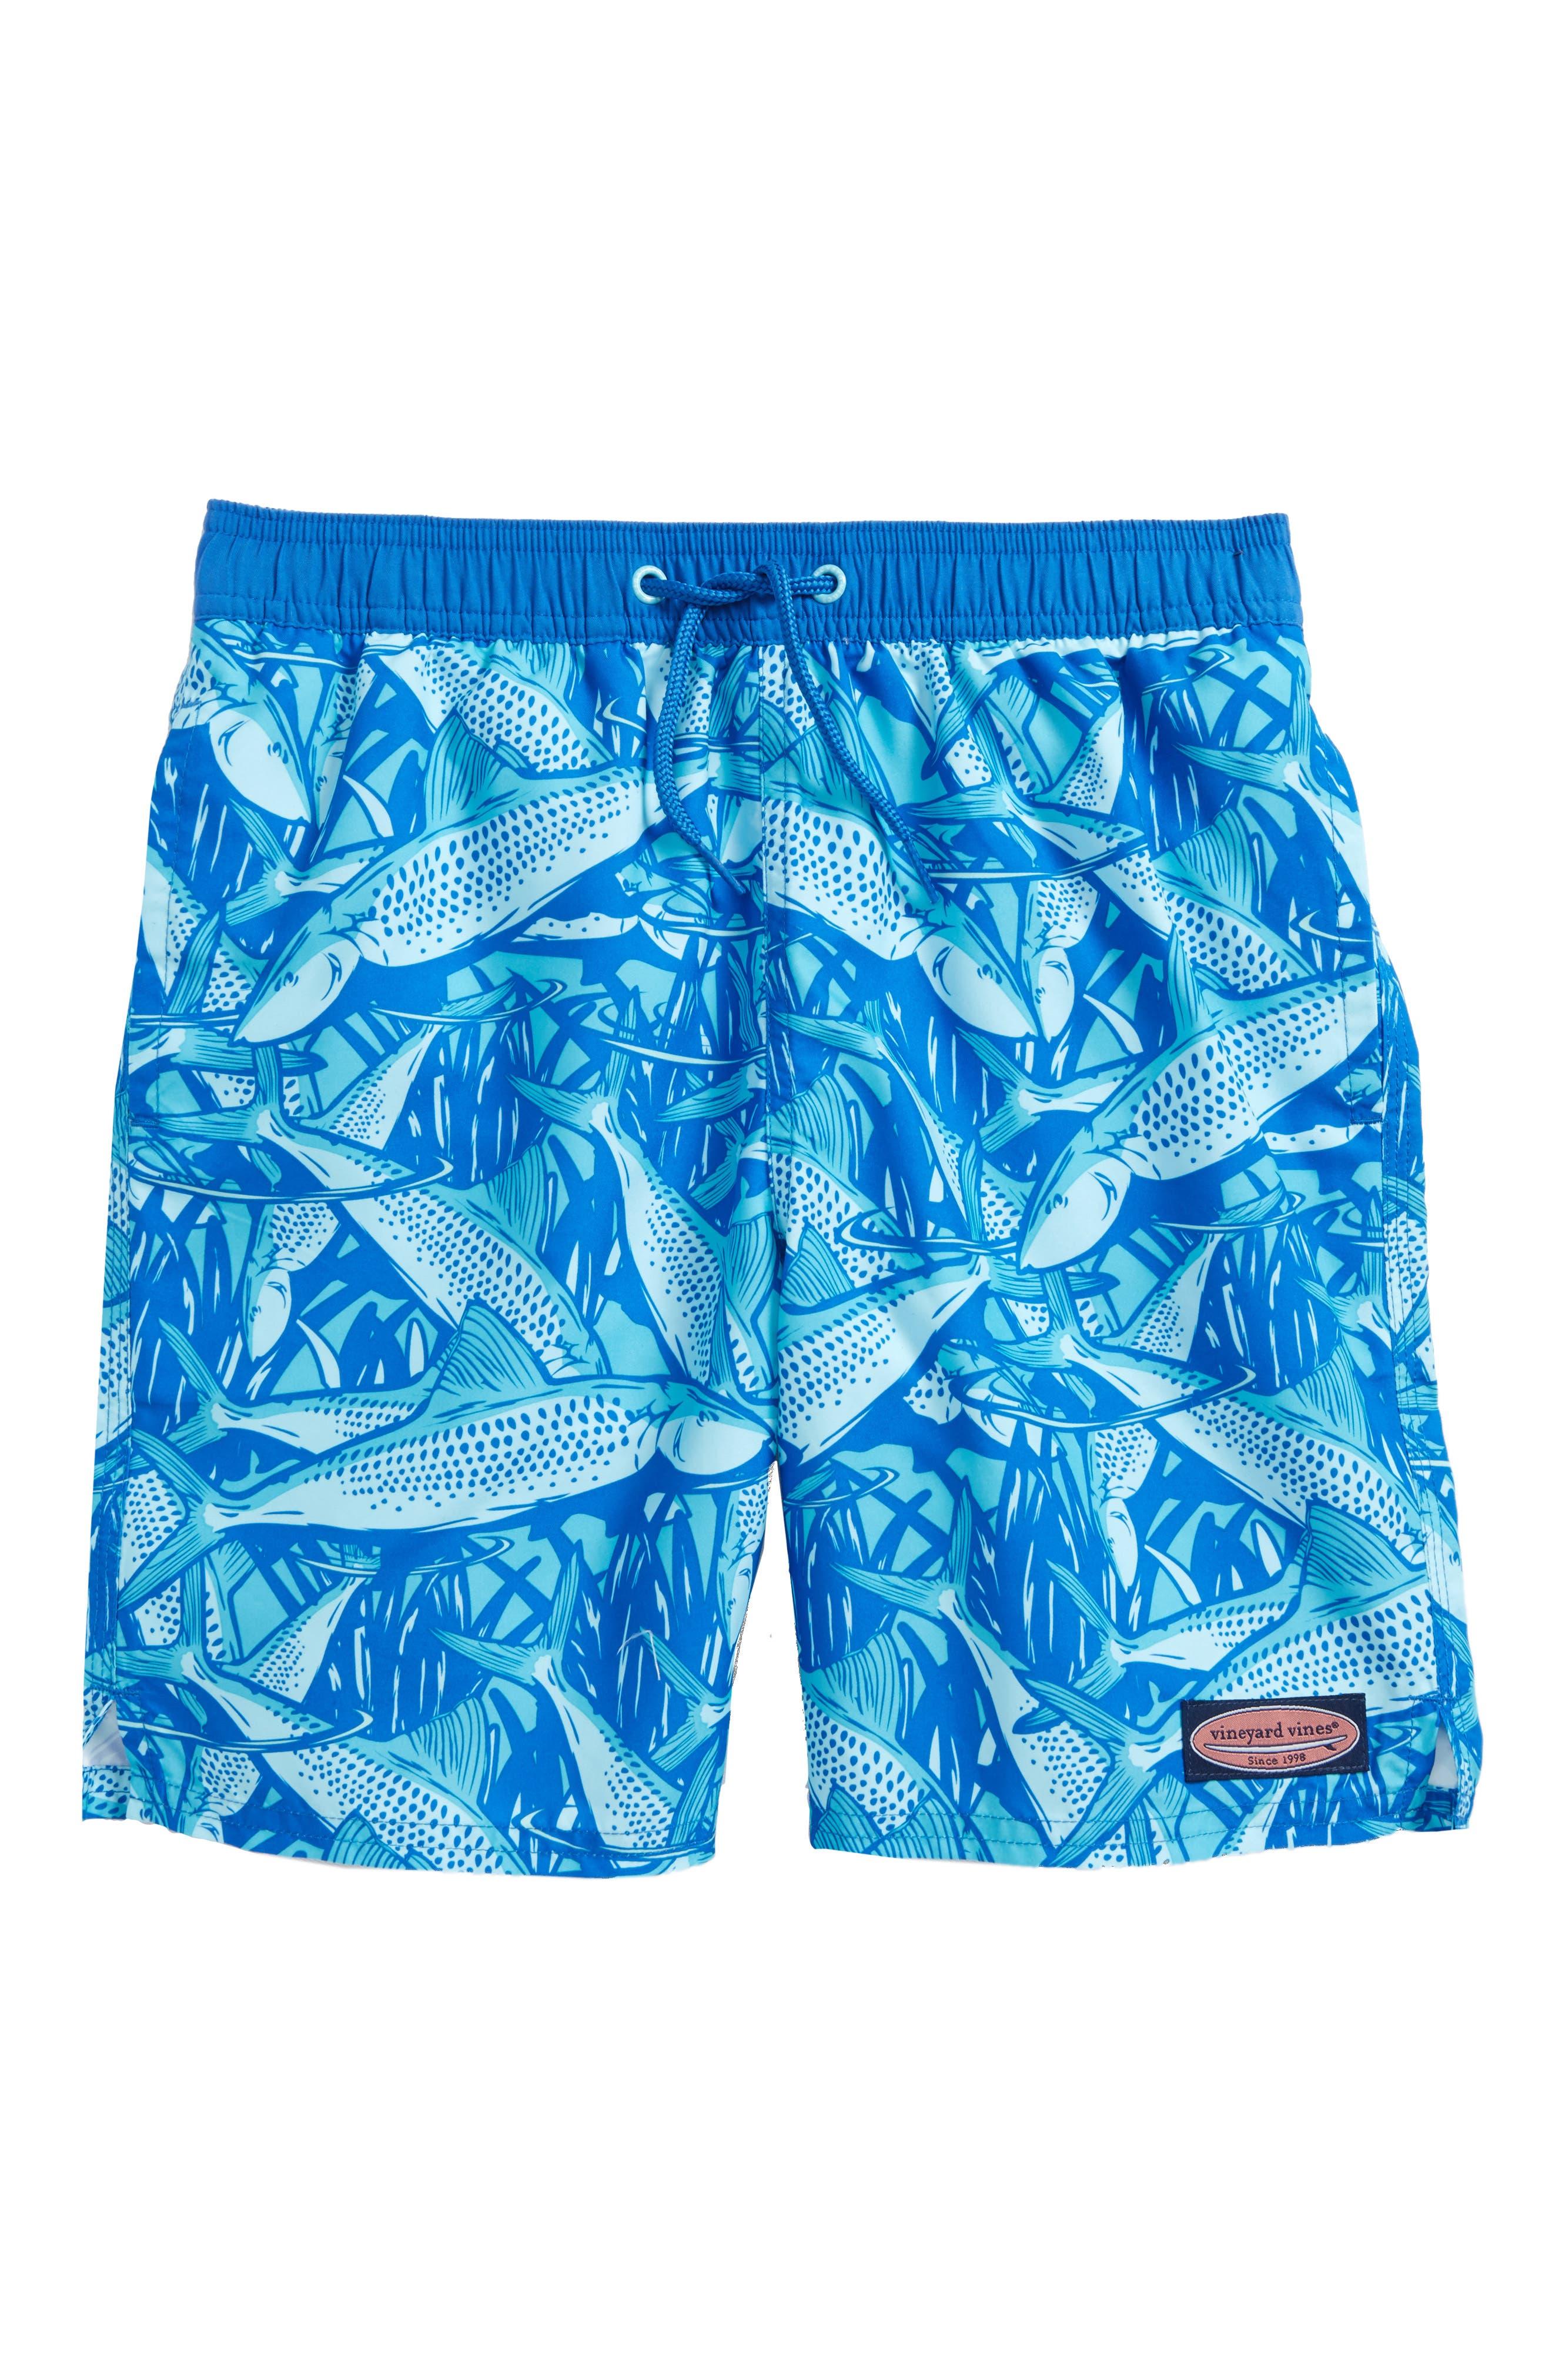 Chappy Bonefish Swim Trunks,                         Main,                         color, Turquoise